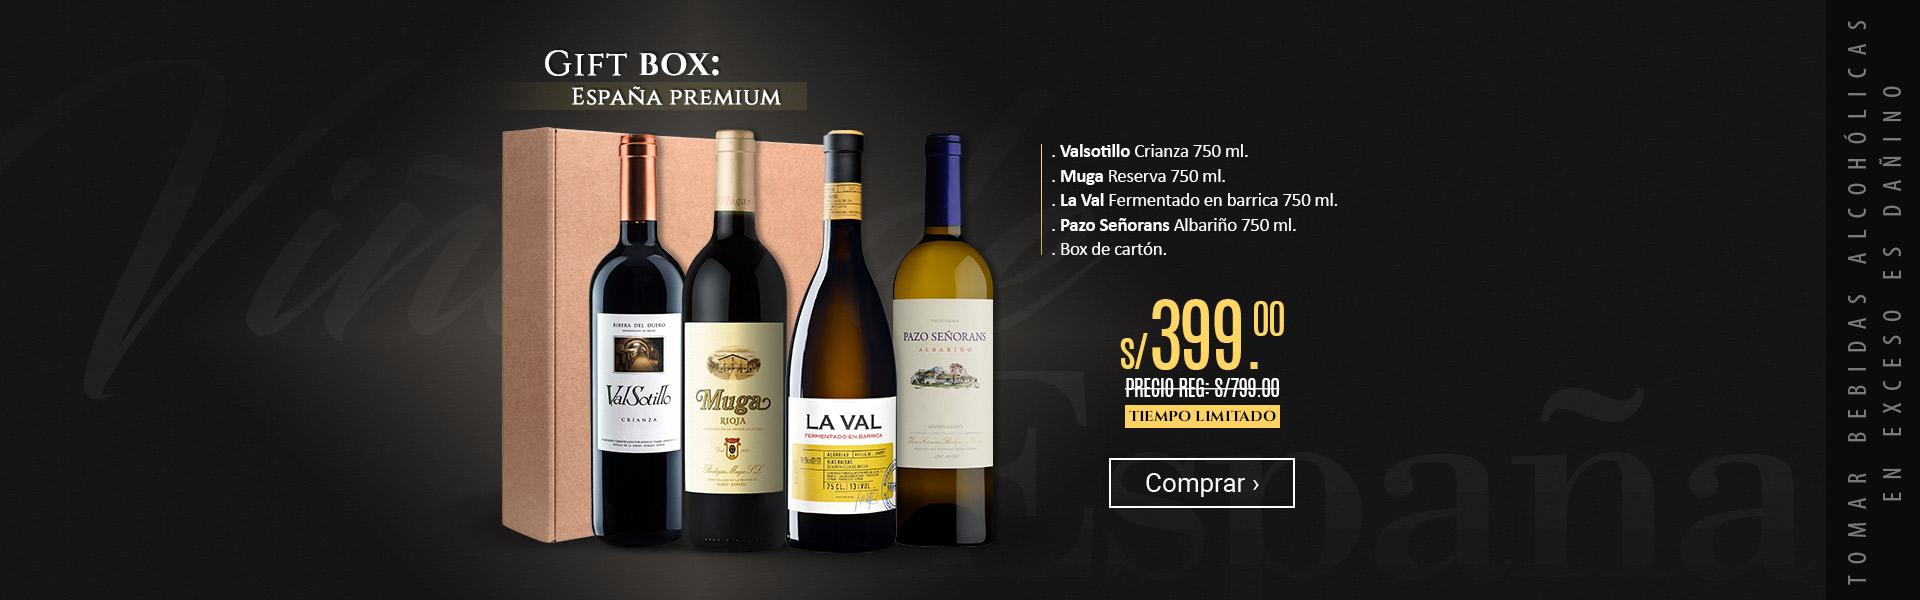 Gift Box España Premium